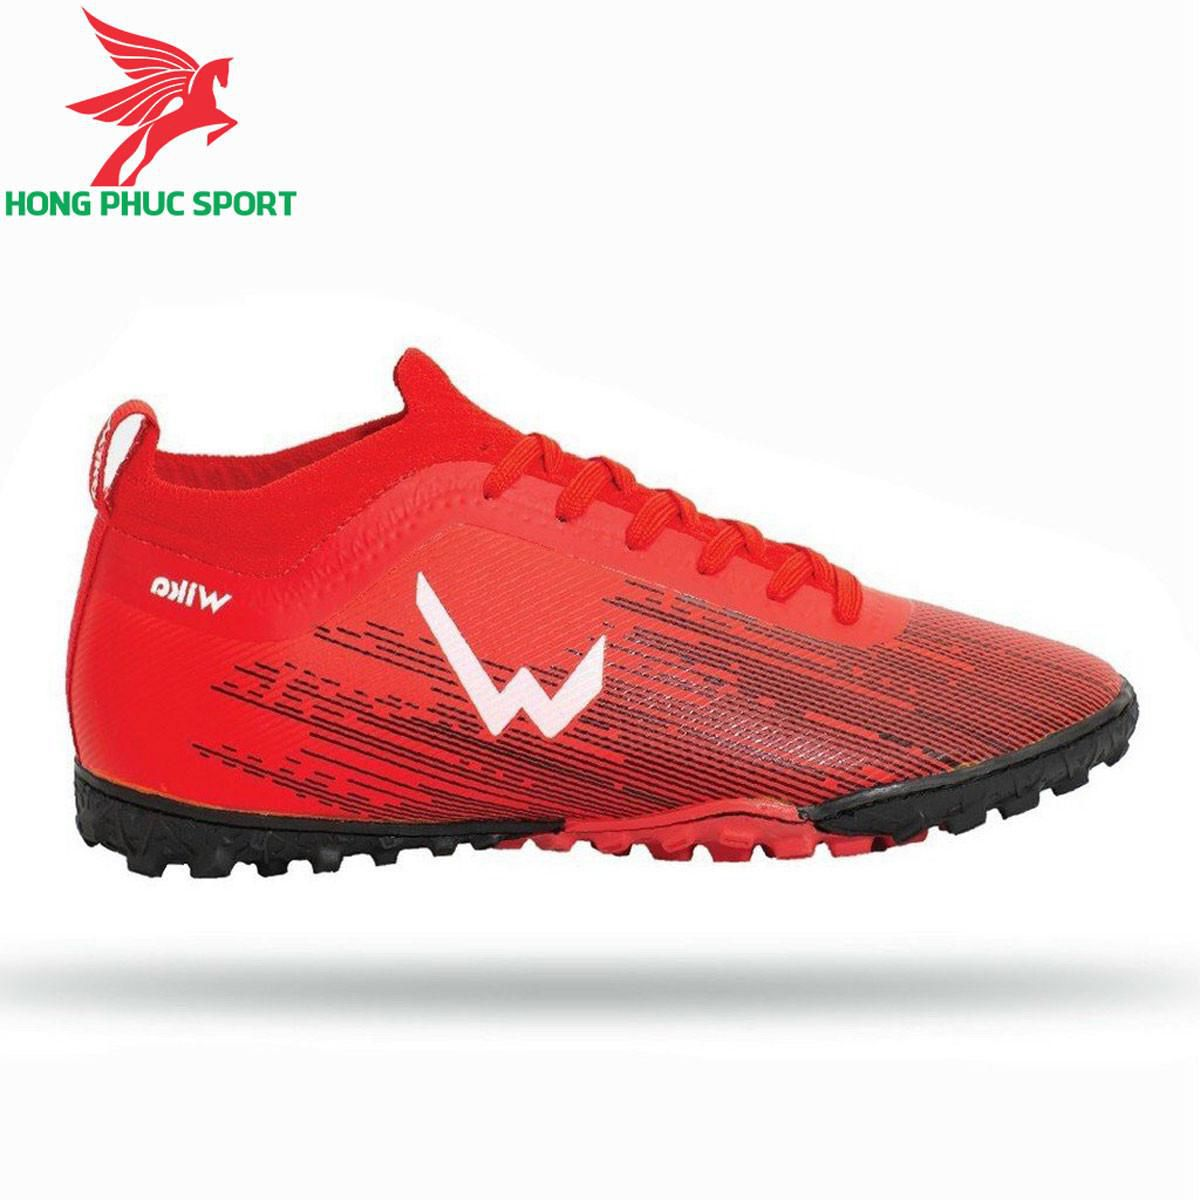 https://cdn.hongphucsport.com/unsafe/s4.shopbay.vn/files/285/4b01af54f84a0b14525b-603dee503b5f8.jpg